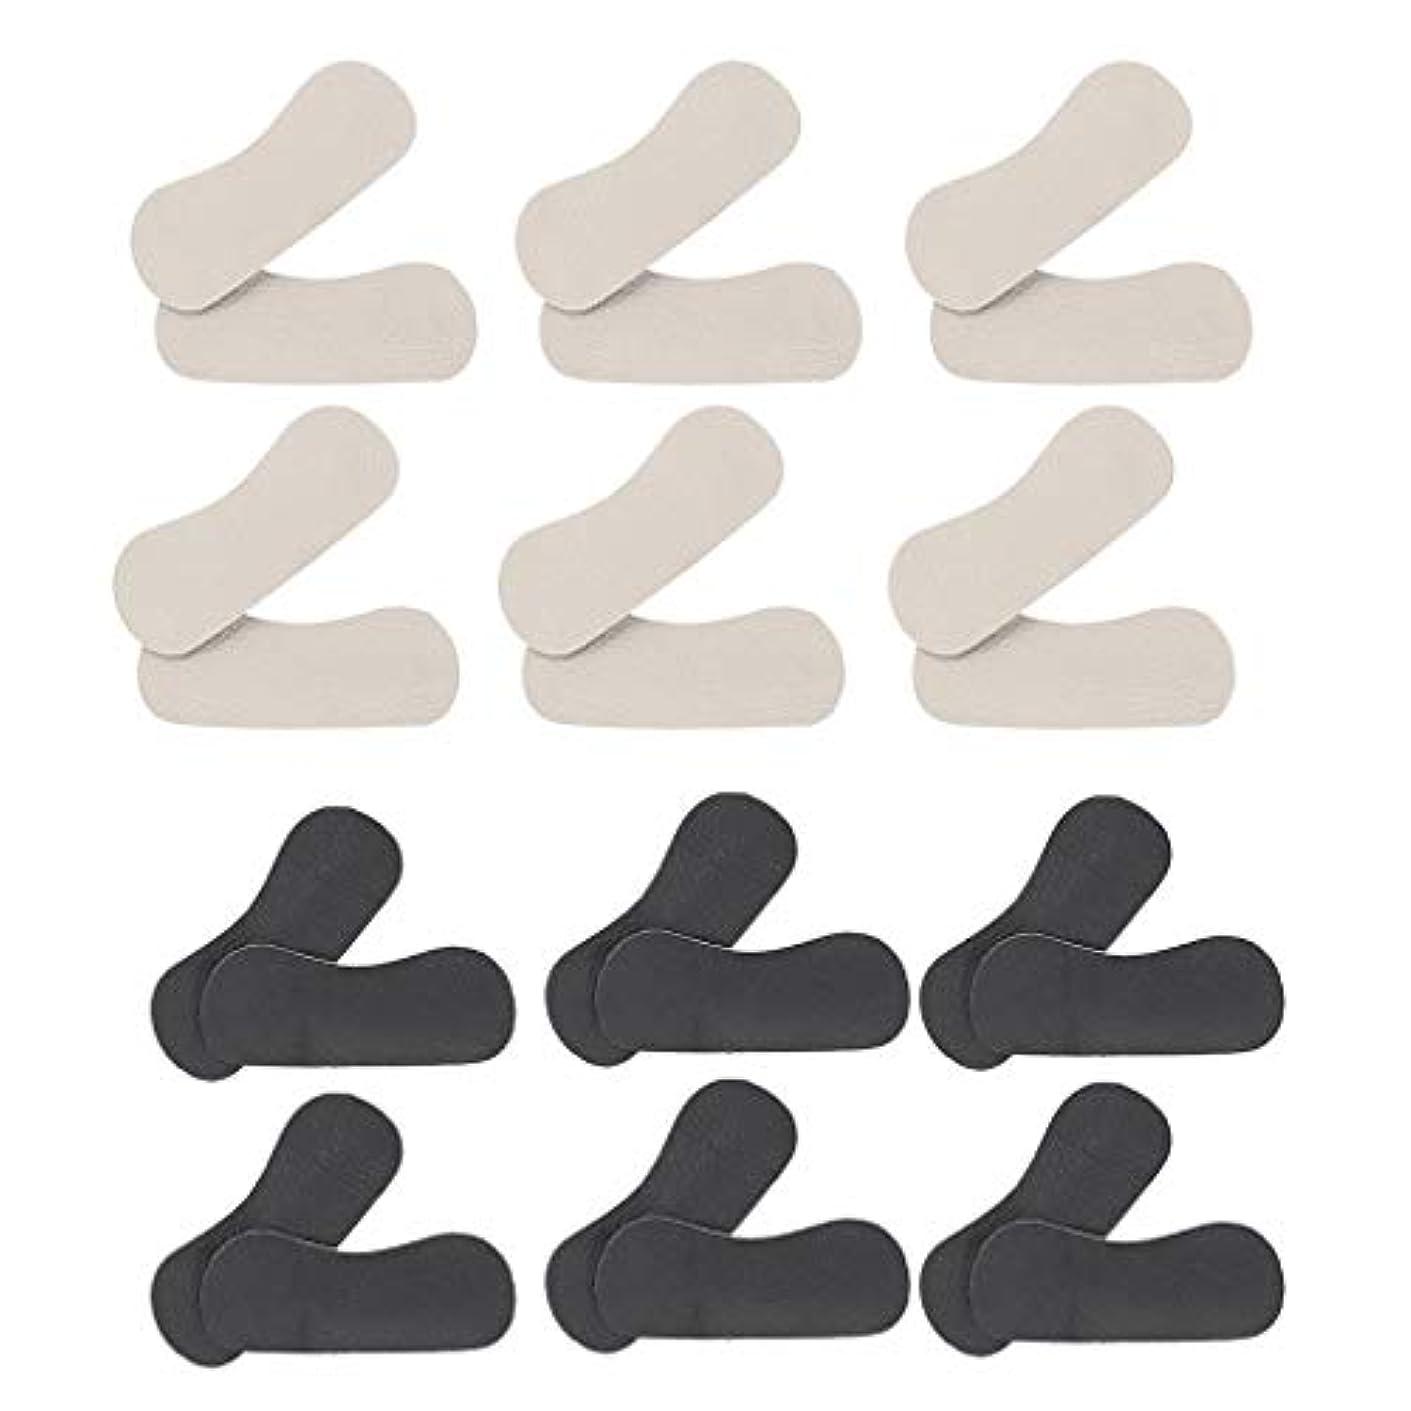 dailymall 靴擦れ防止 かかと パッドクッション かかとパッド フットケア プロテクター 滑り止め